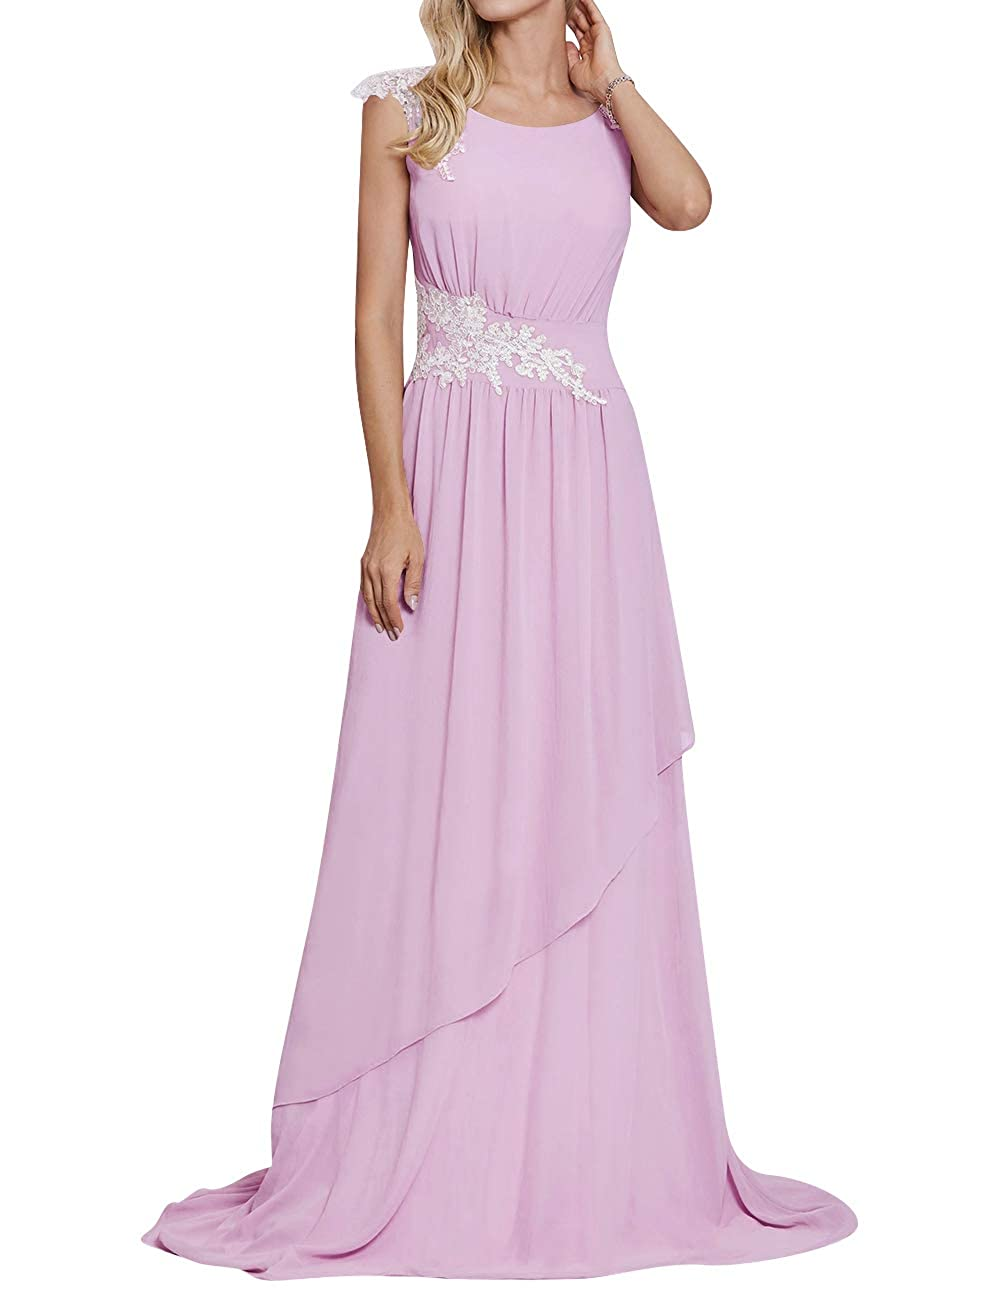 Lavender Long Evening Party Dress Scoop Mother of The Bride Dresses Lace Appliques